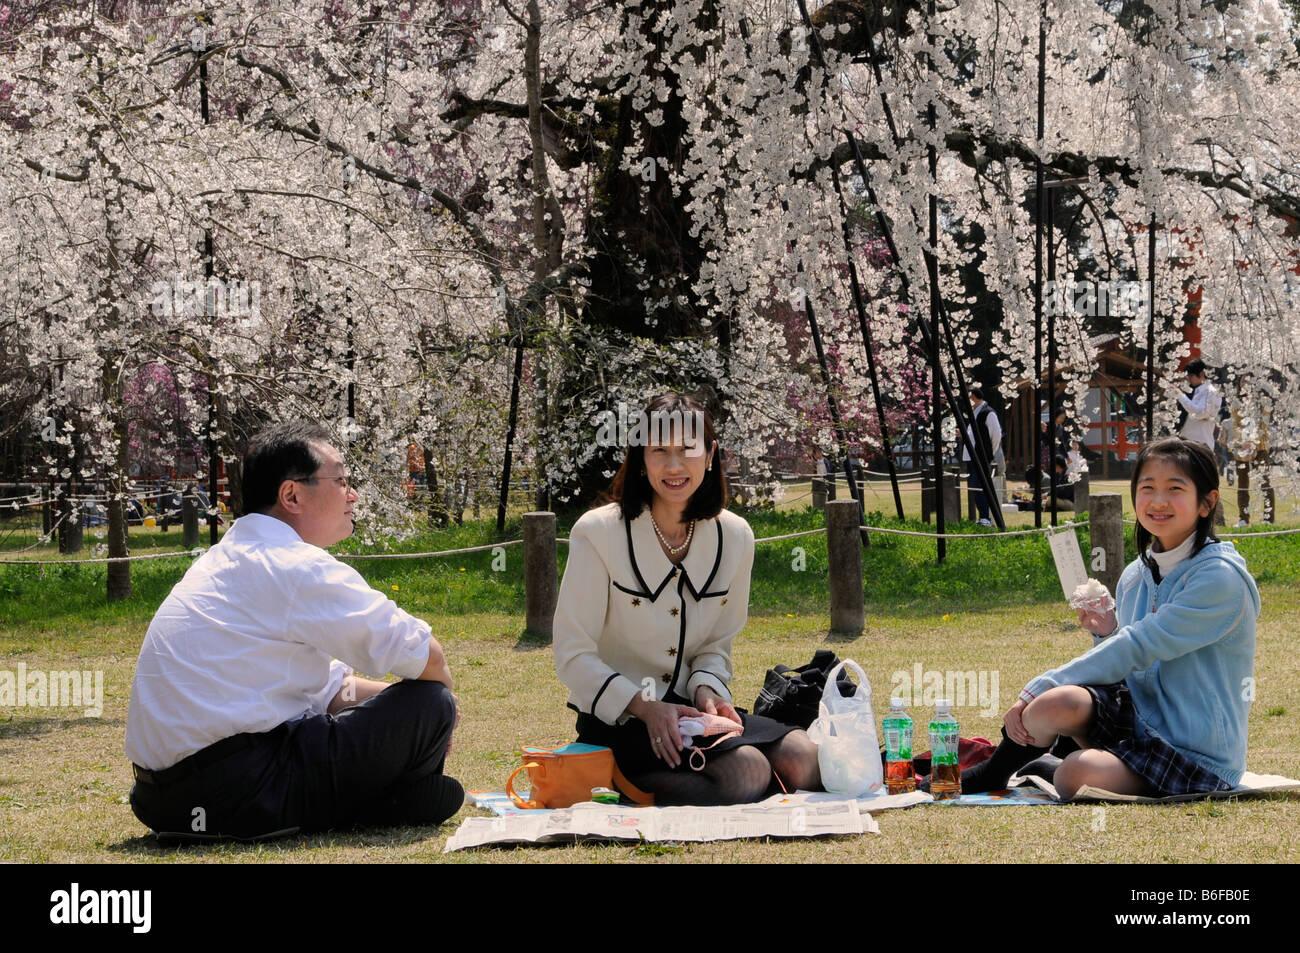 Family celebrating the Cherry Blossom Festival under a blossoming cherry tree in Kamogamo Shrine, Kyoto, Japan, - Stock Image